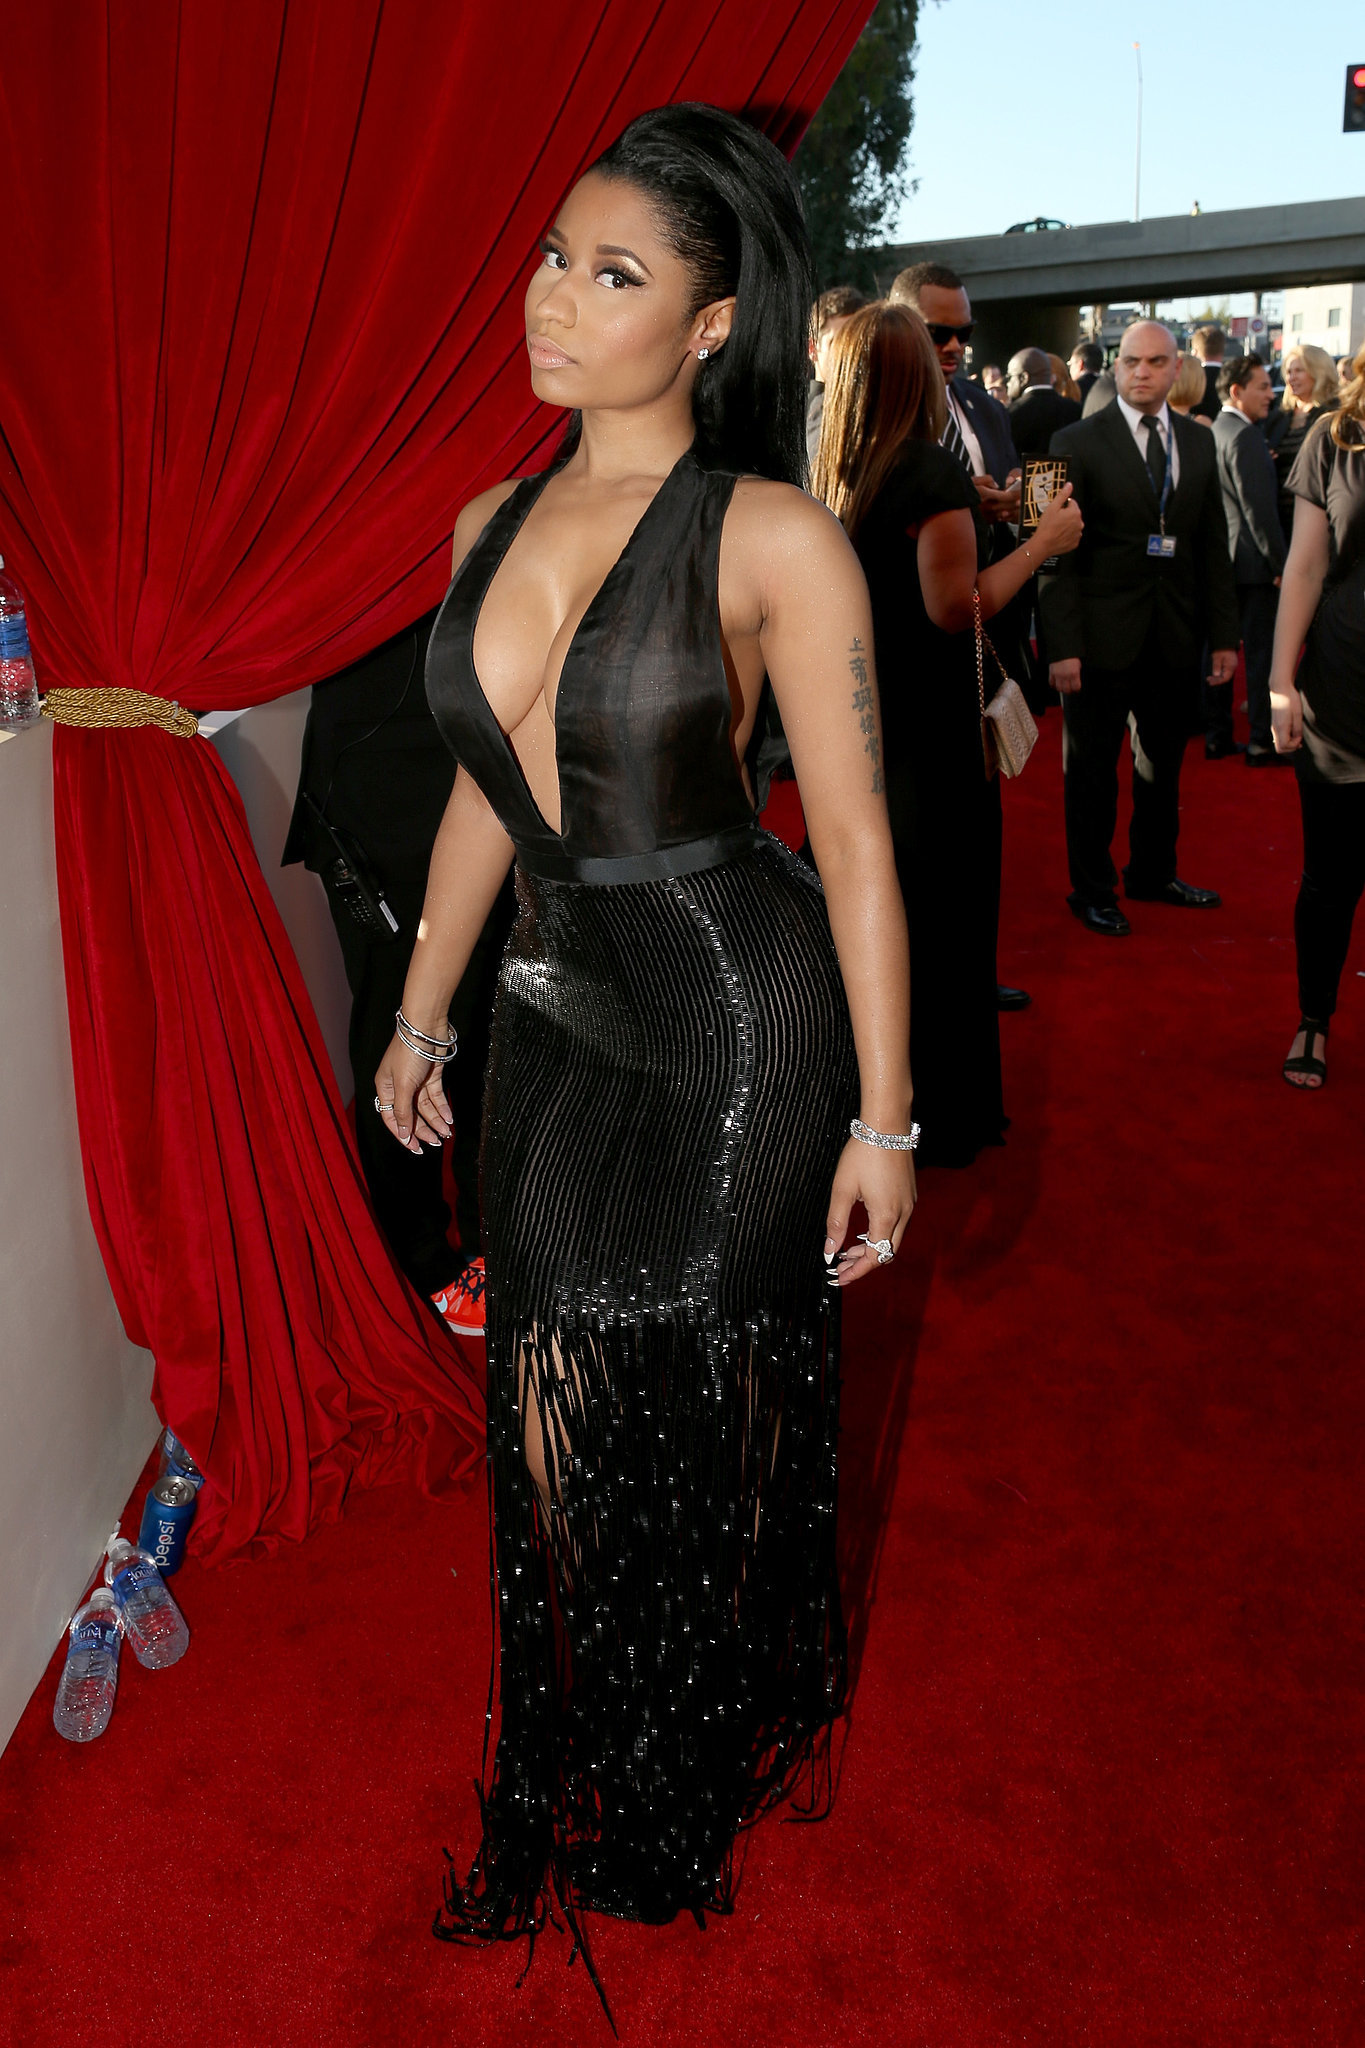 Nicki Minaj S Dress At The Grammy Awards 2015 Popsugar